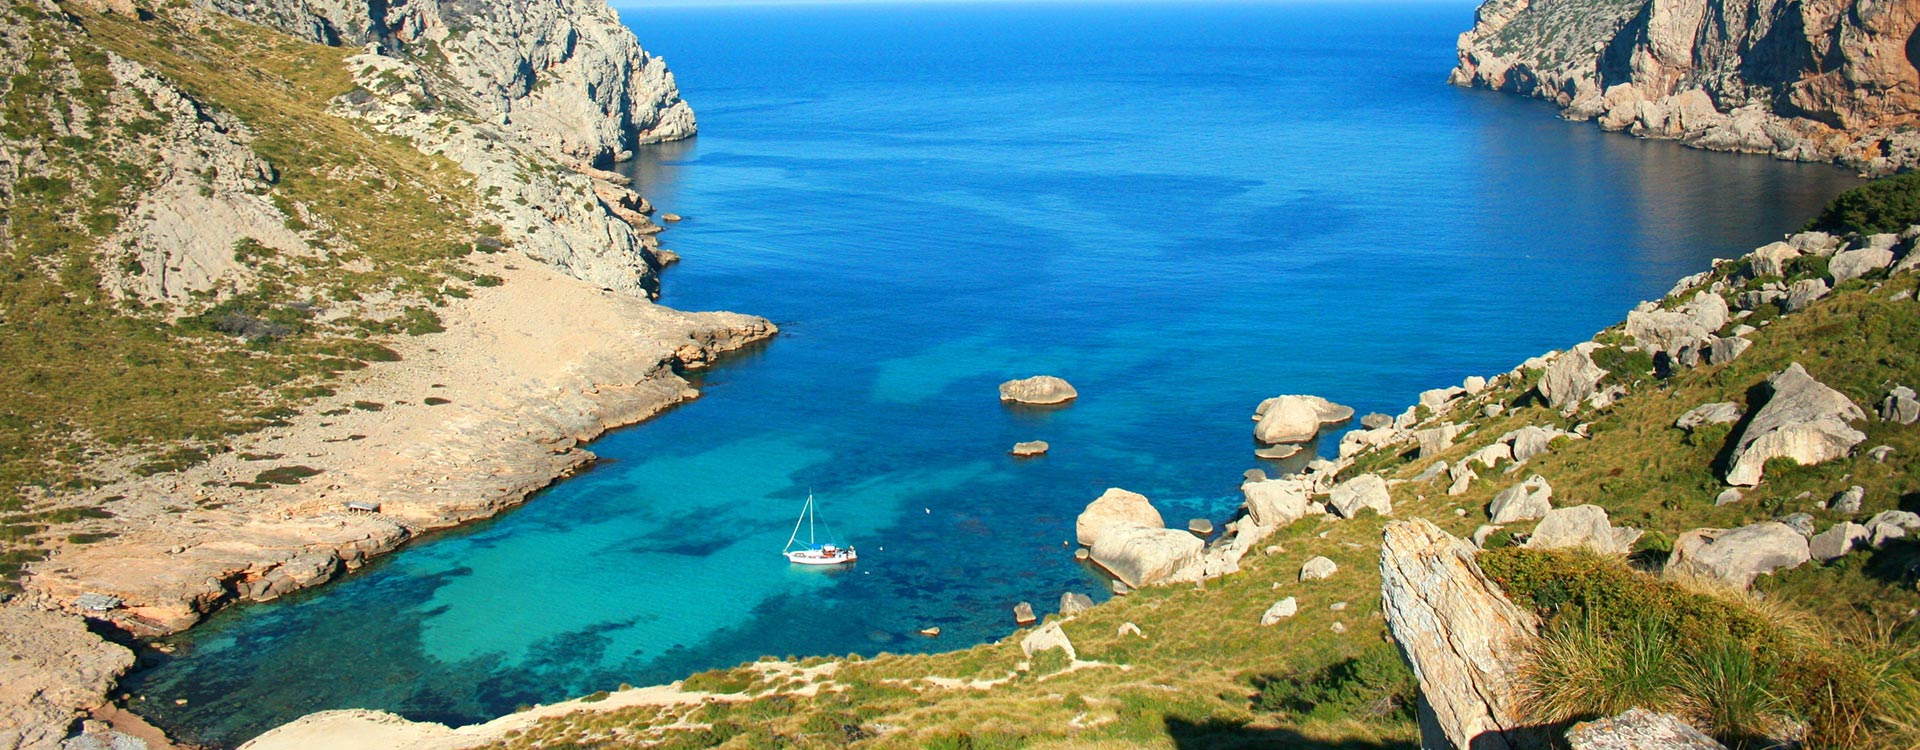 Excursión en barco por la Serra Tramuntana en Mallorca